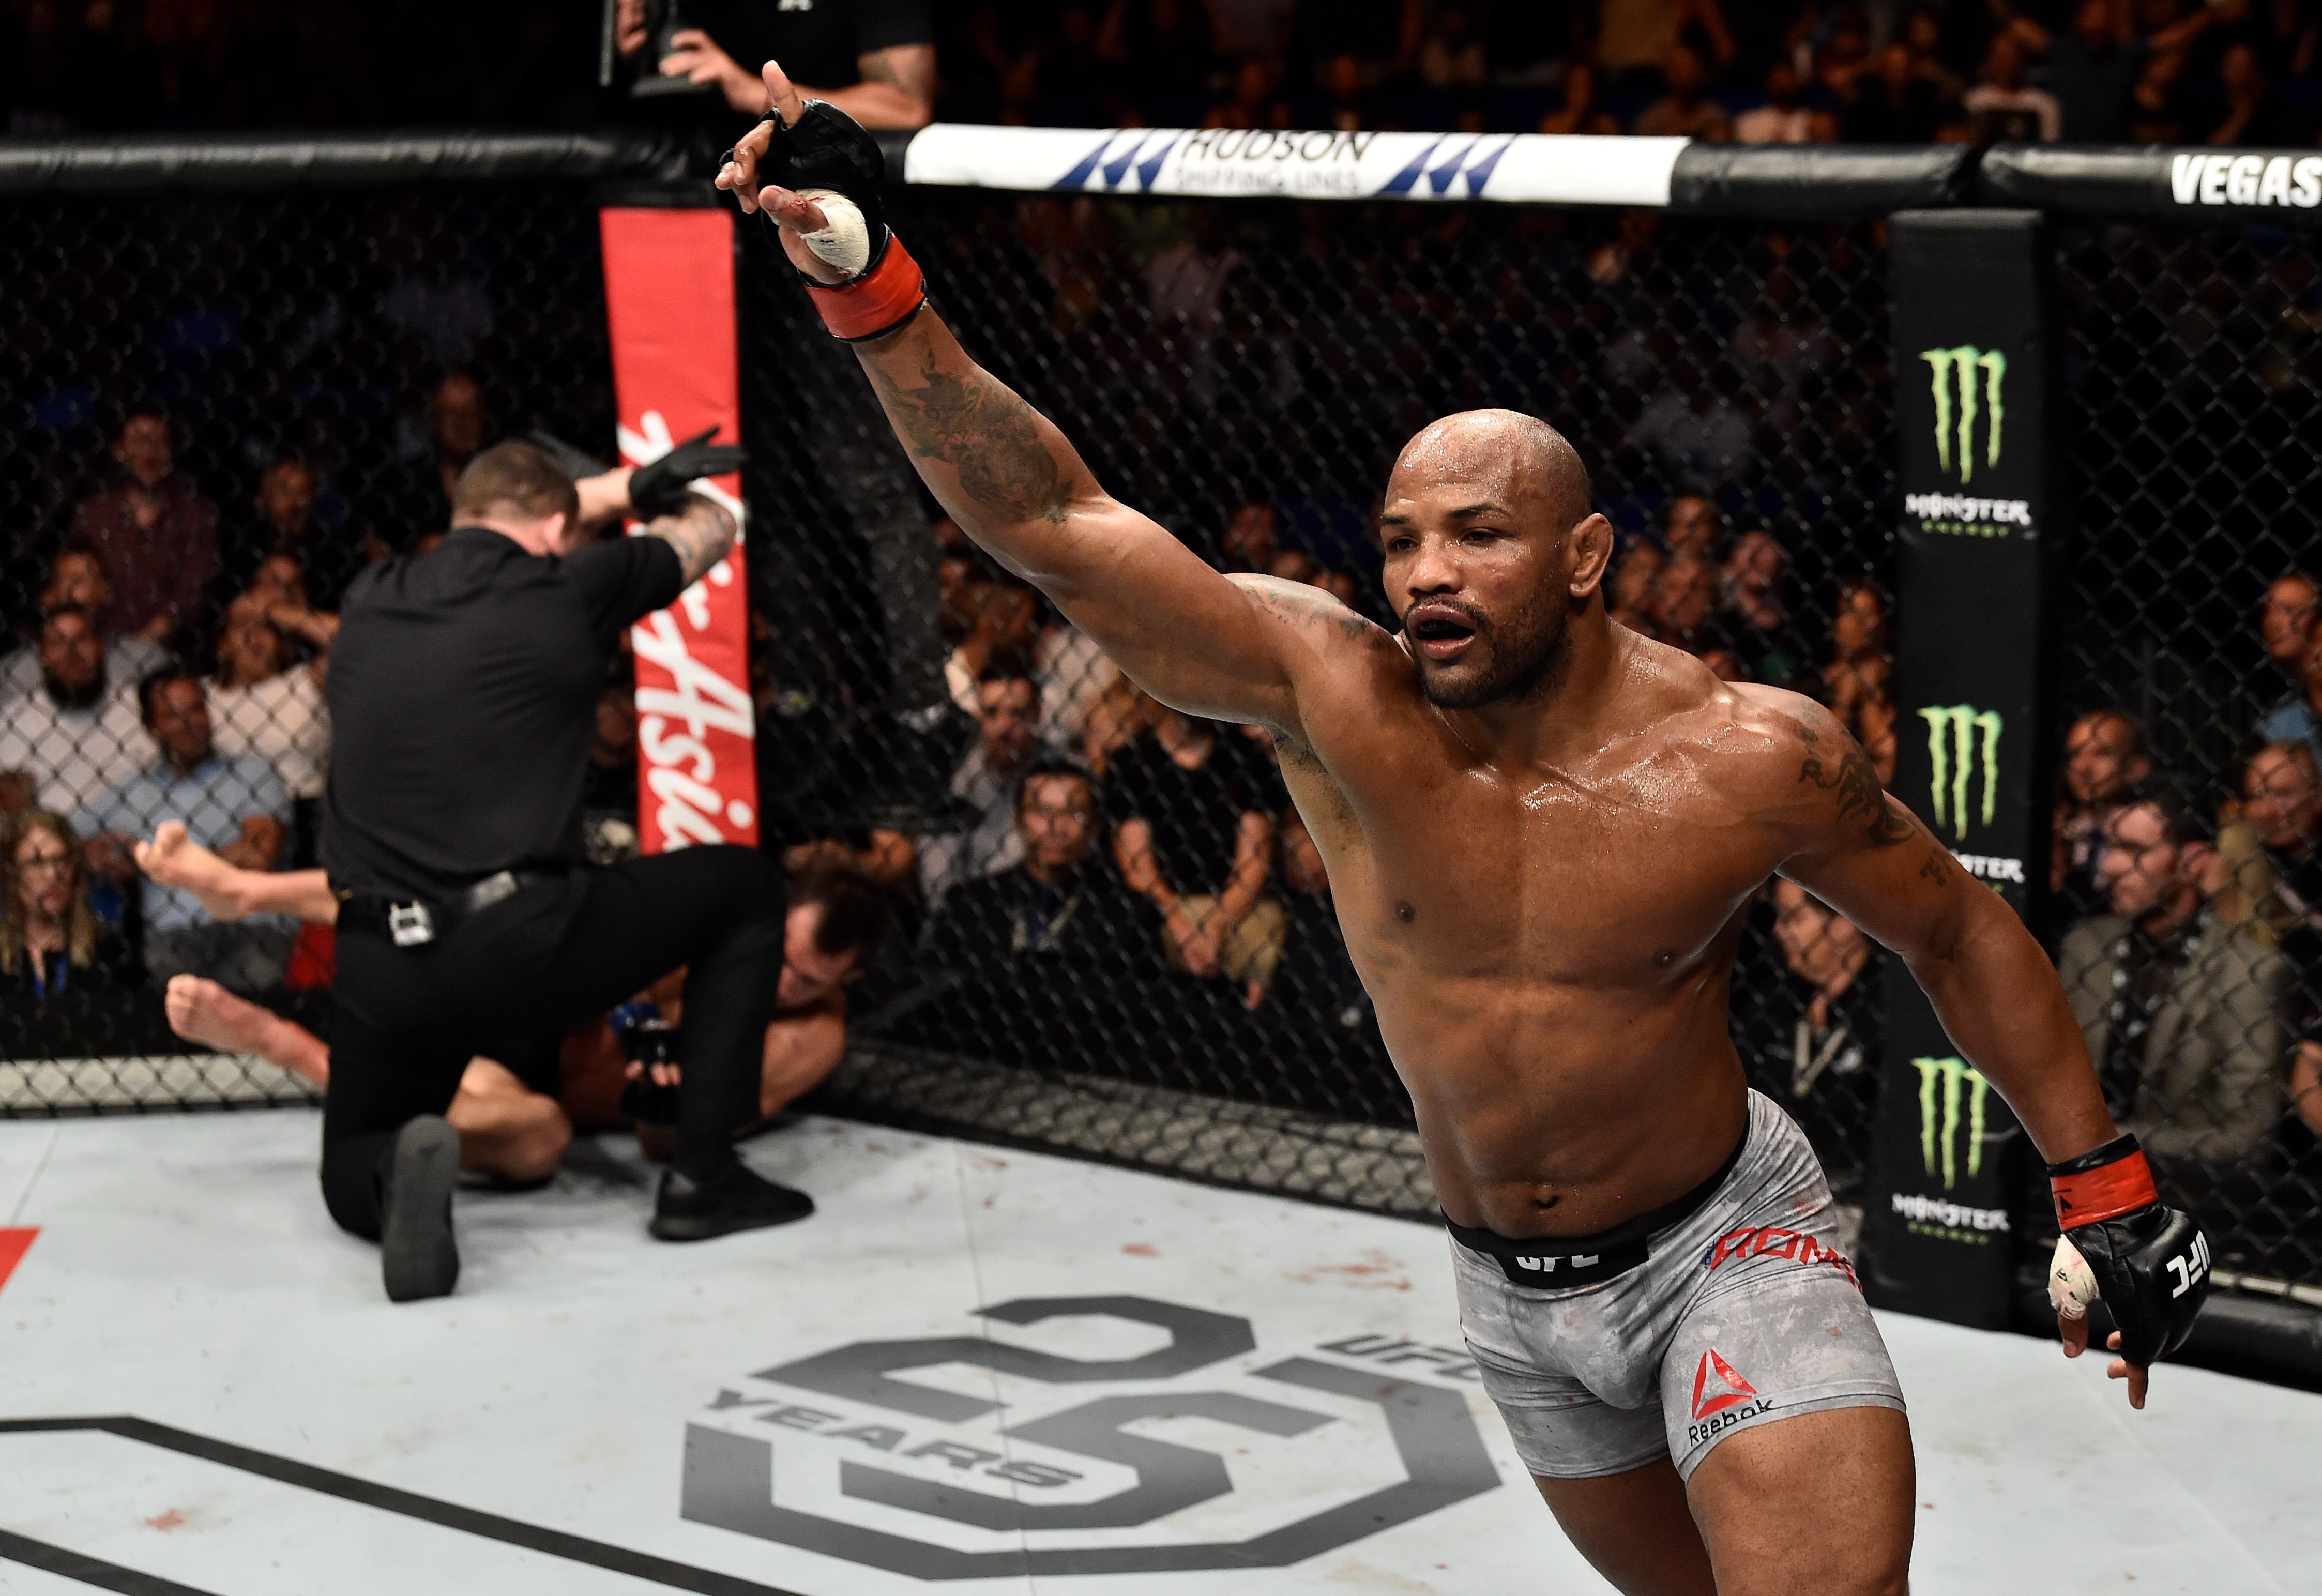 UFC 221: Romero v Rockhold